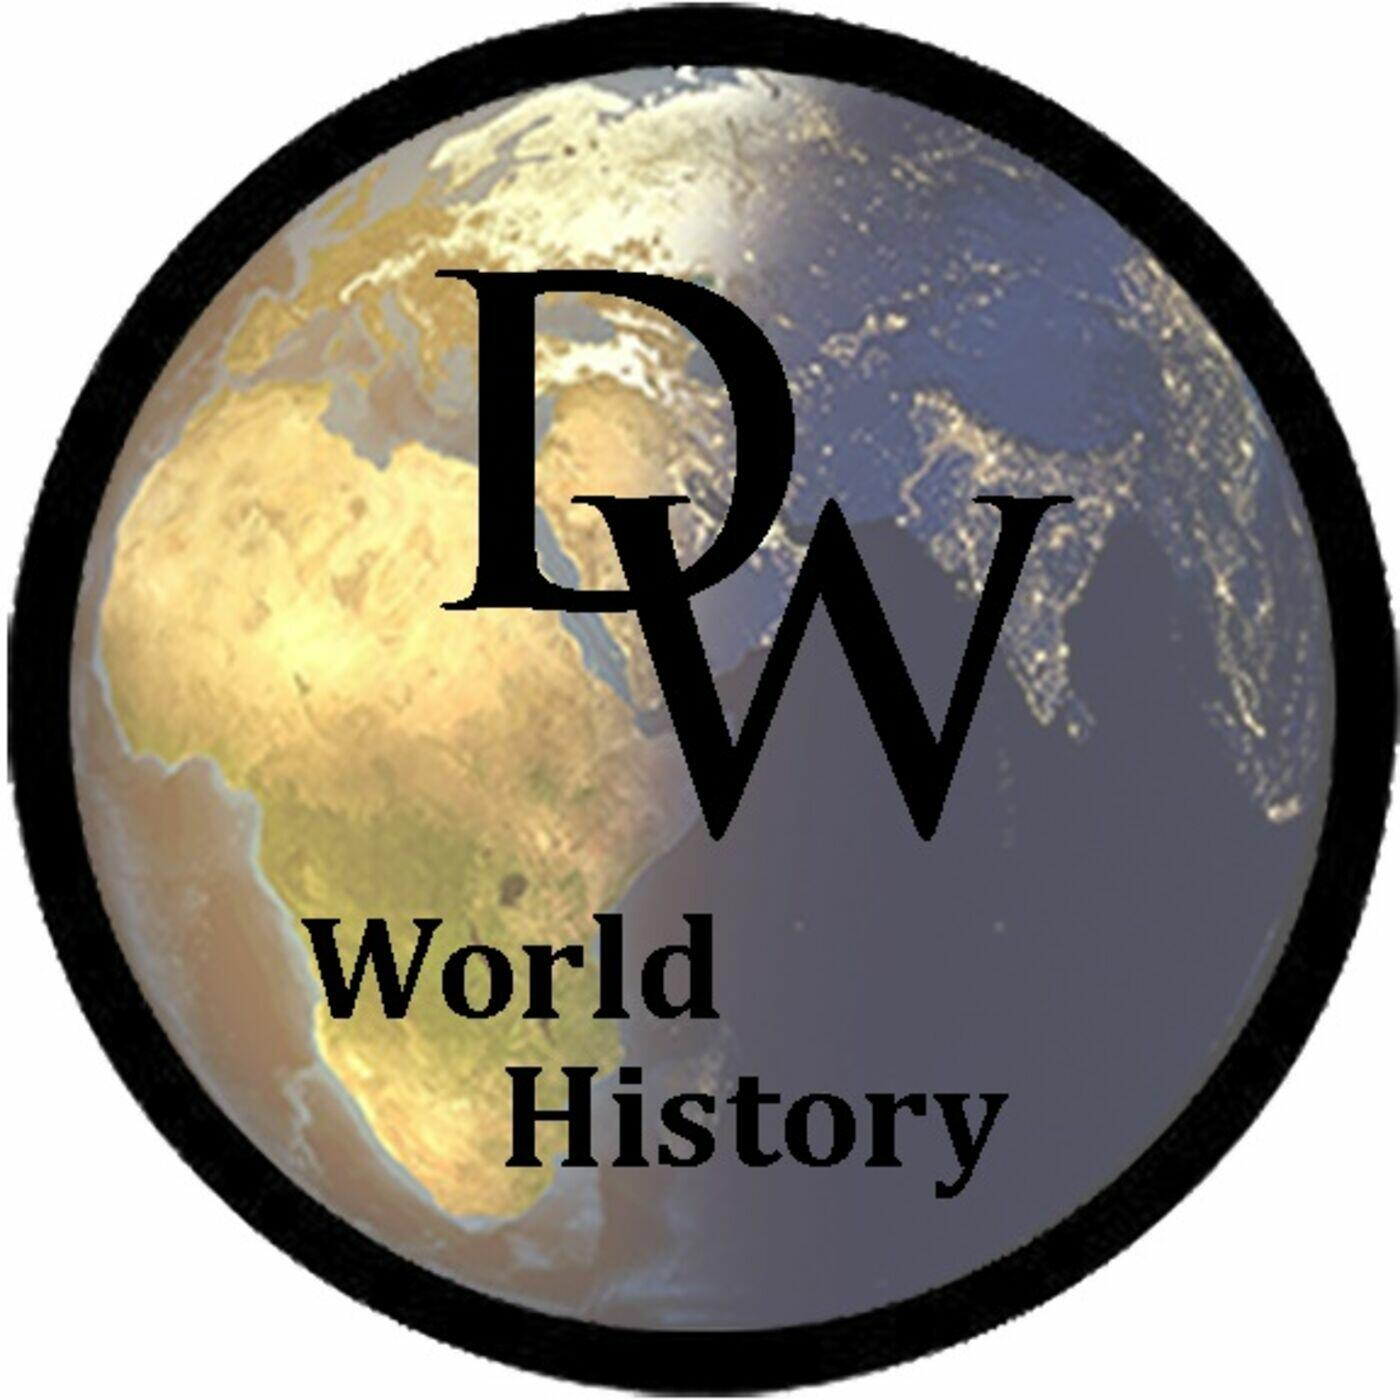 DW World History